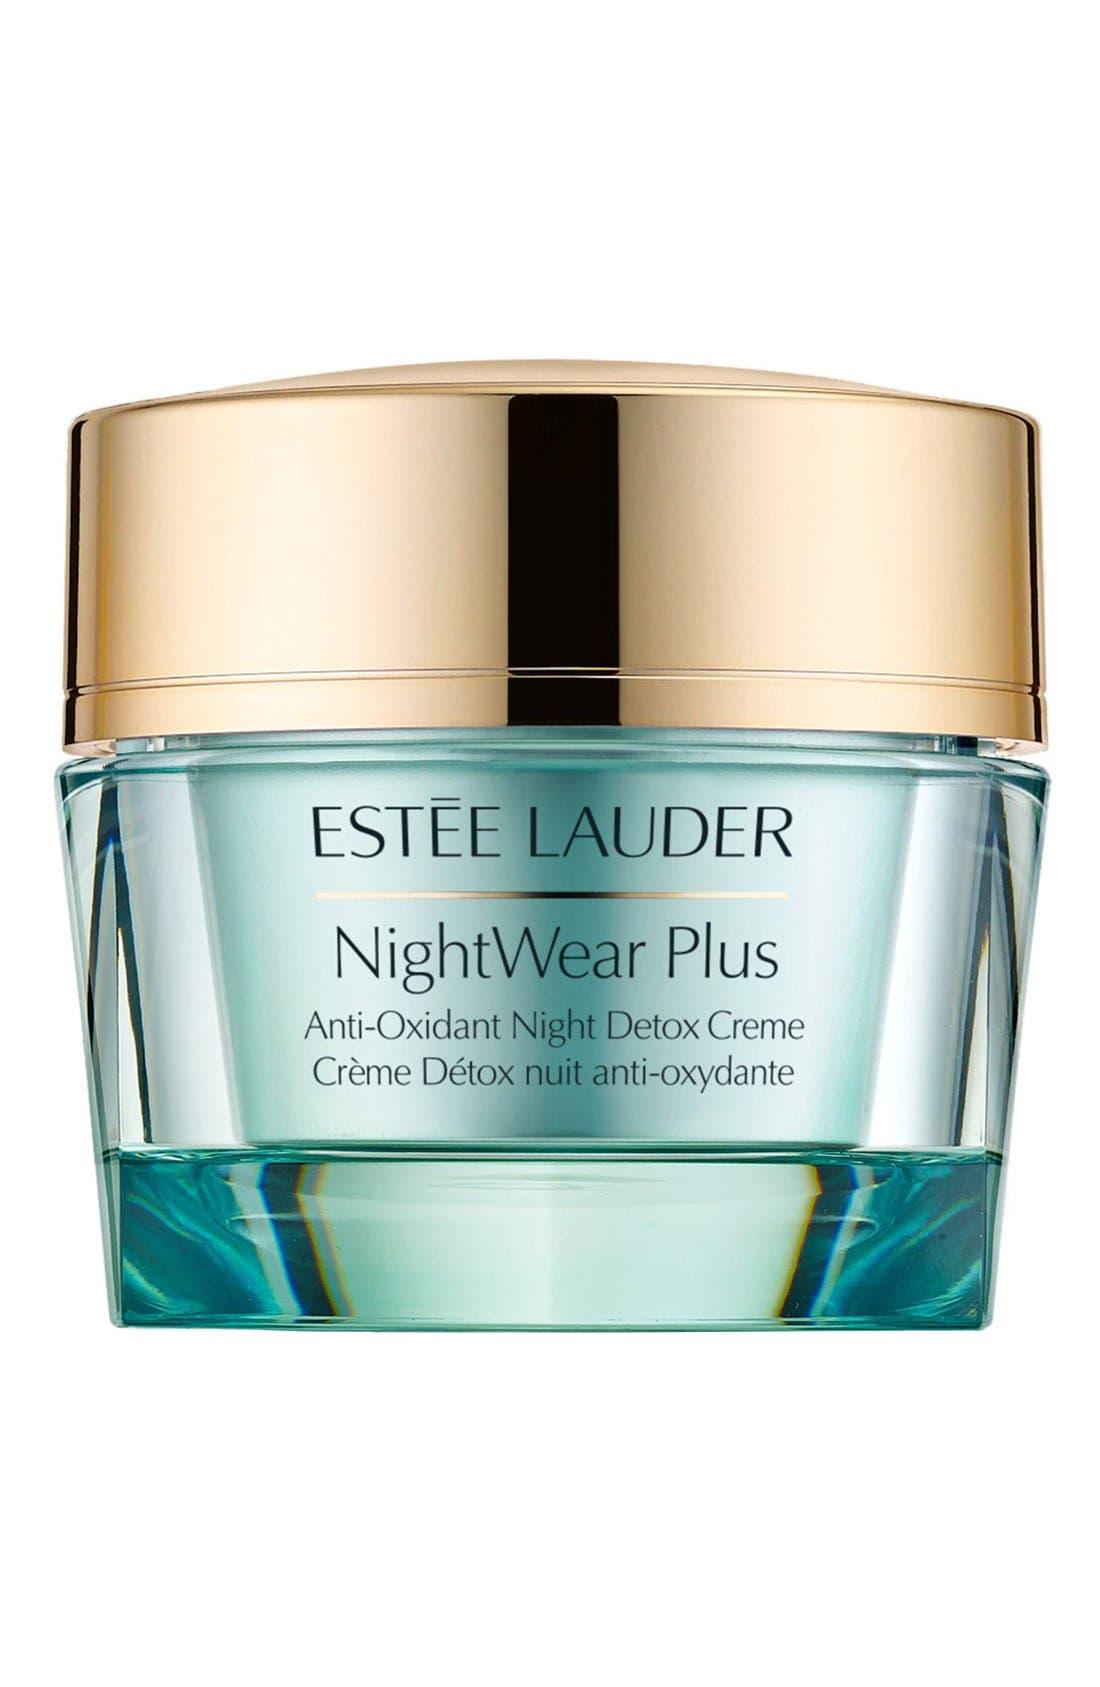 NightWear Plus Antioxidant Night Detox Cream,                             Main thumbnail 1, color,                             NO COLOR